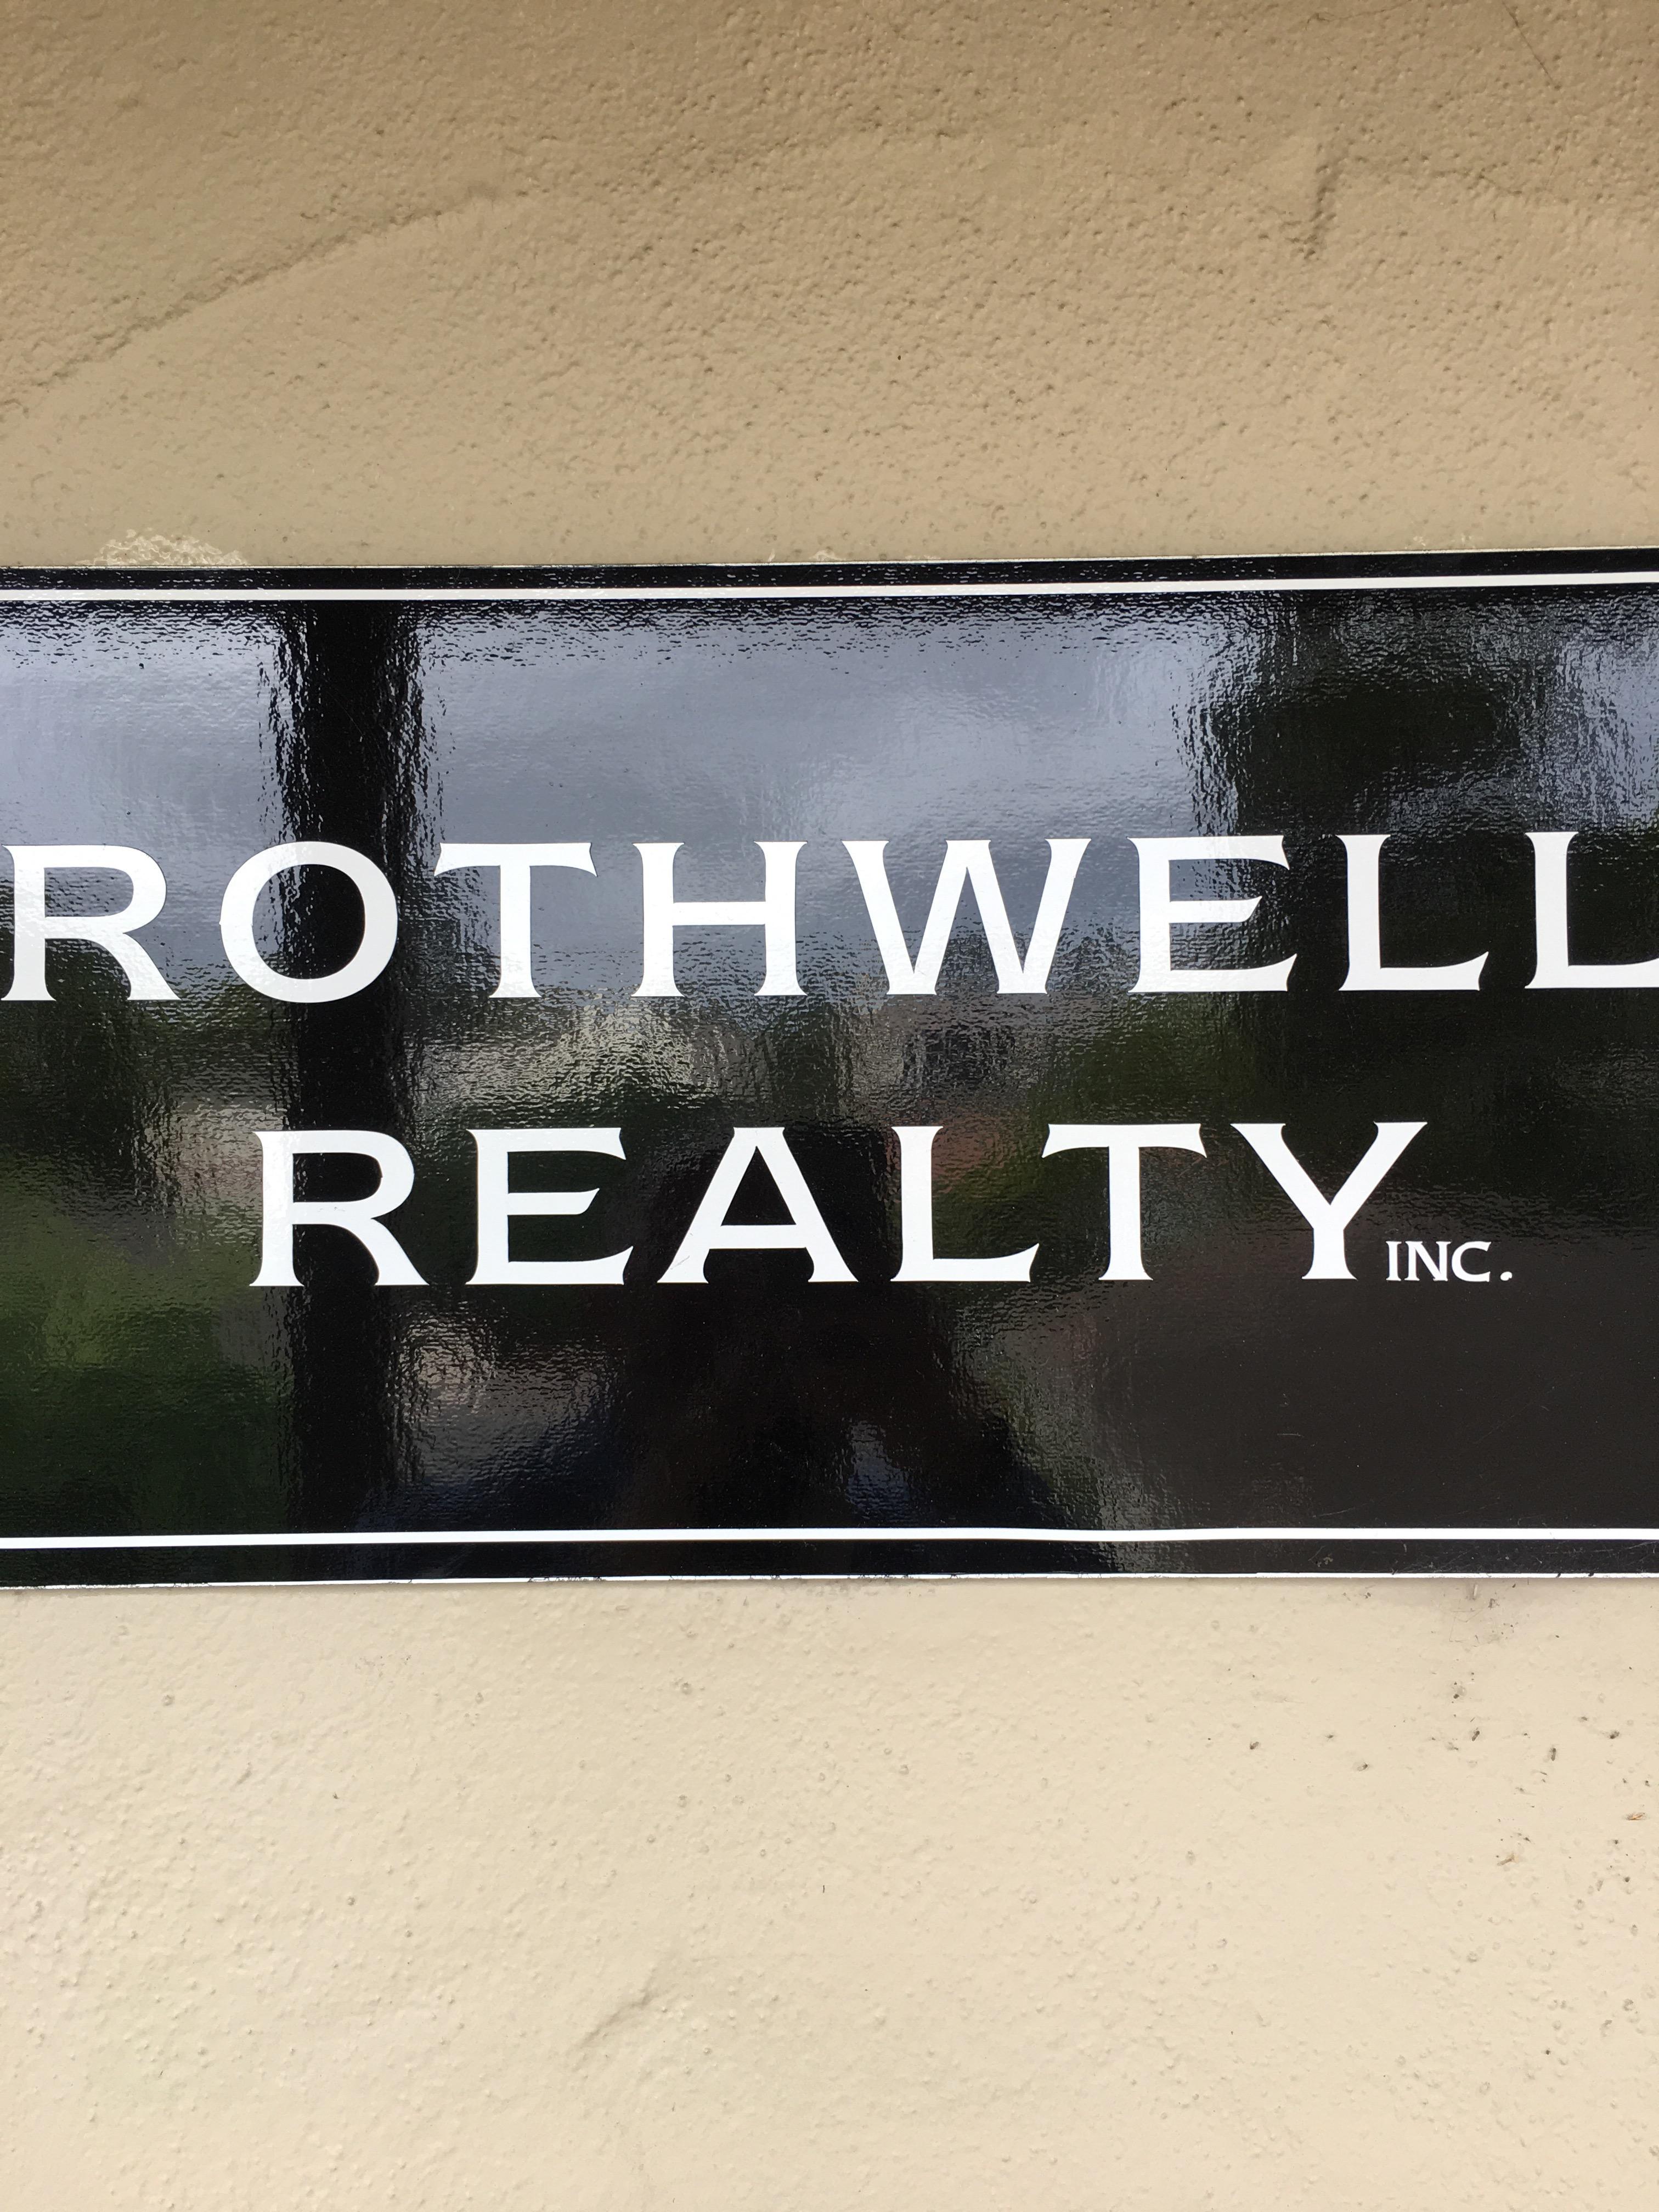 Rothwell Realty